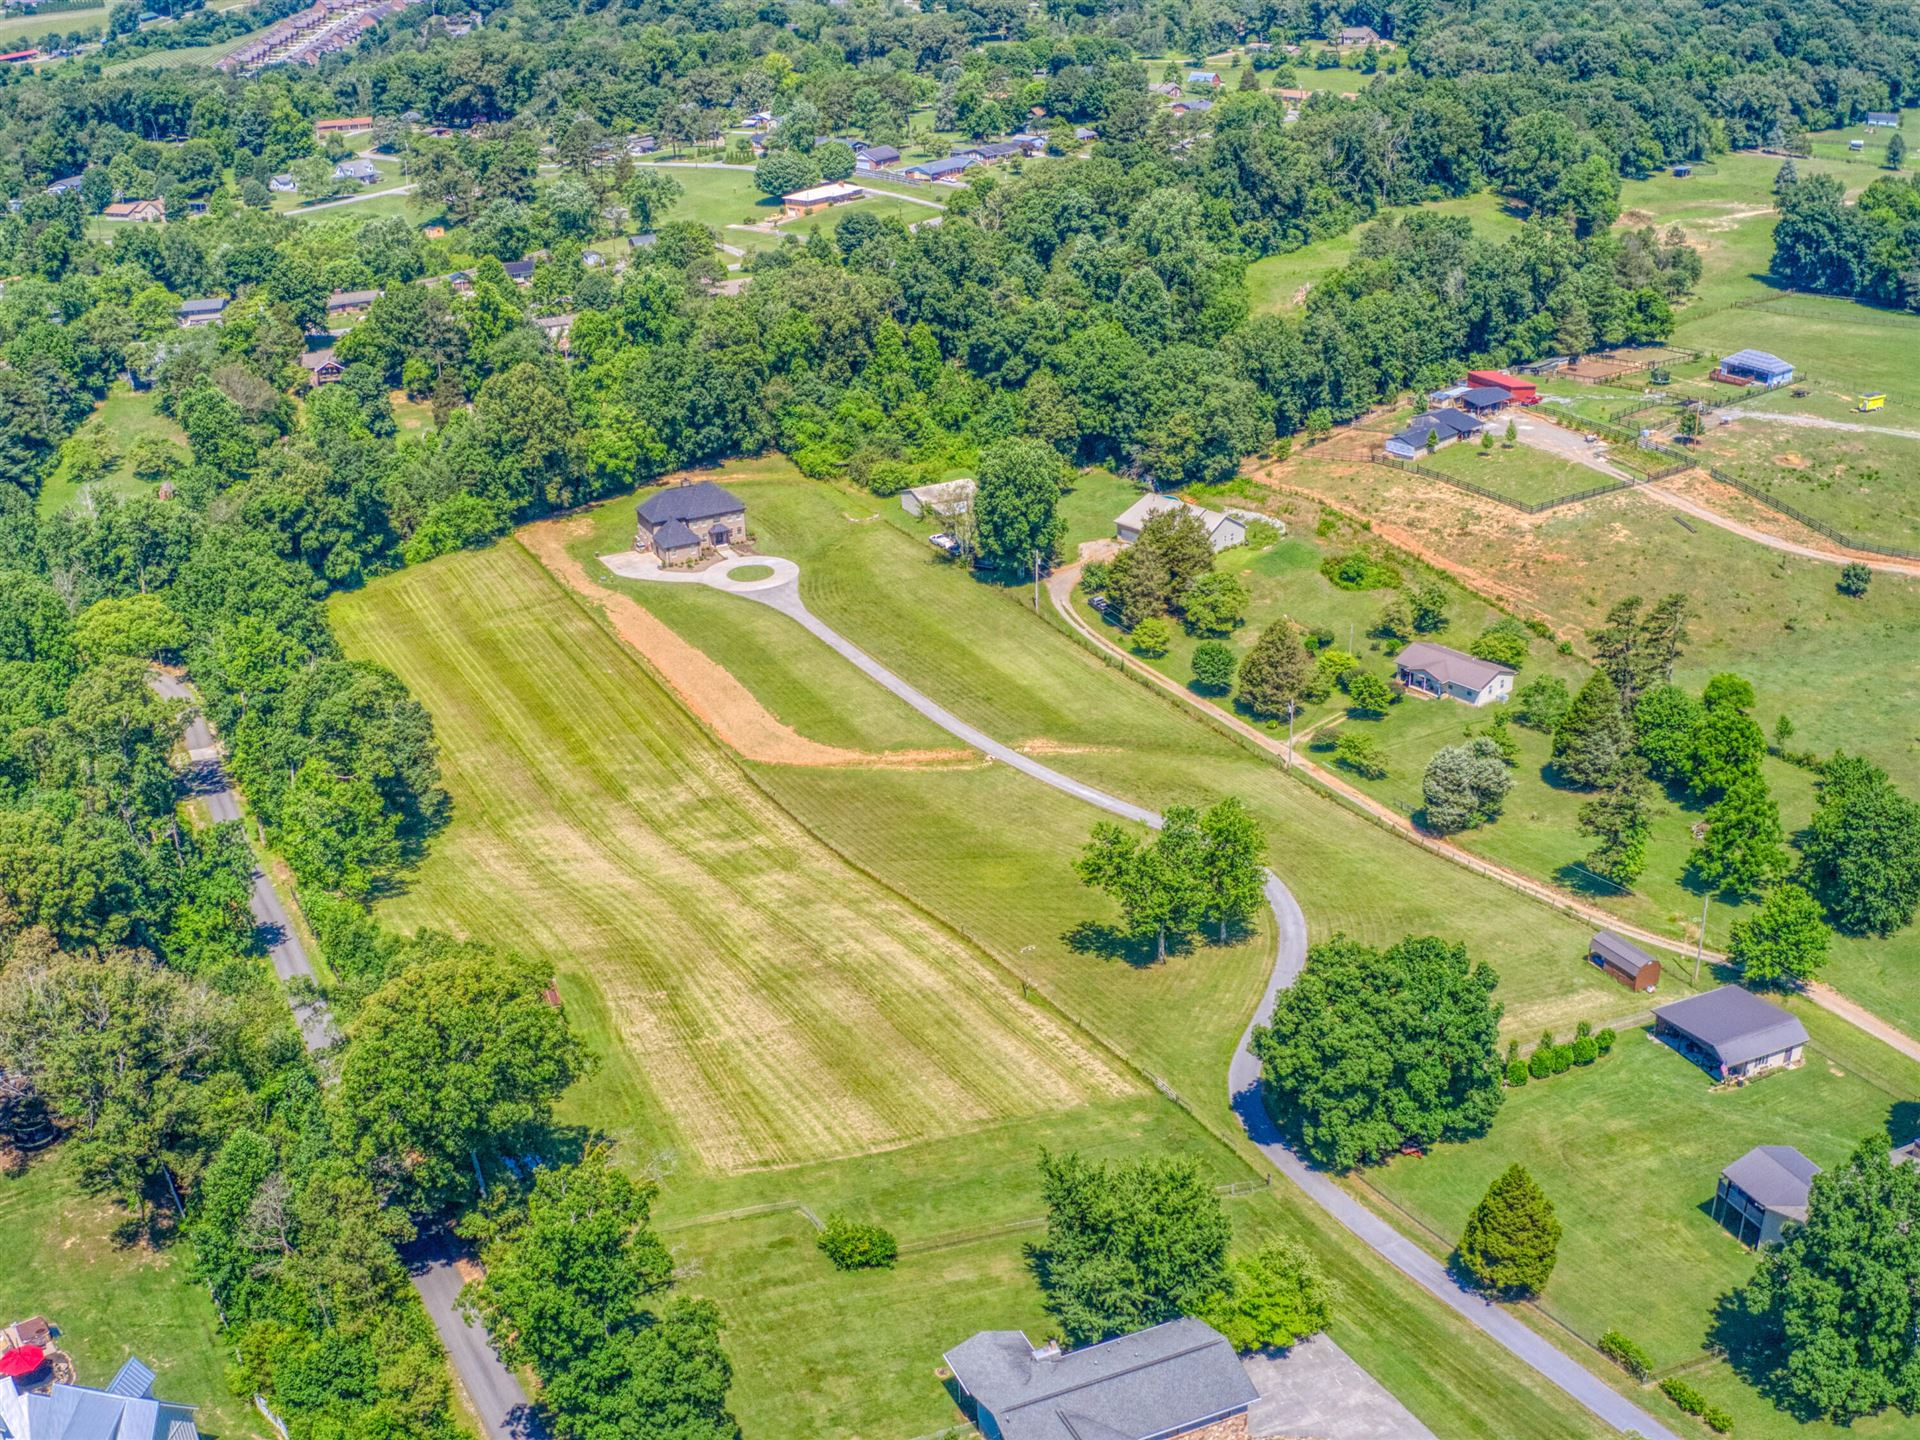 Photo of 573 Dixon Rd, Lenoir City, TN 37772 (MLS # 1157766)